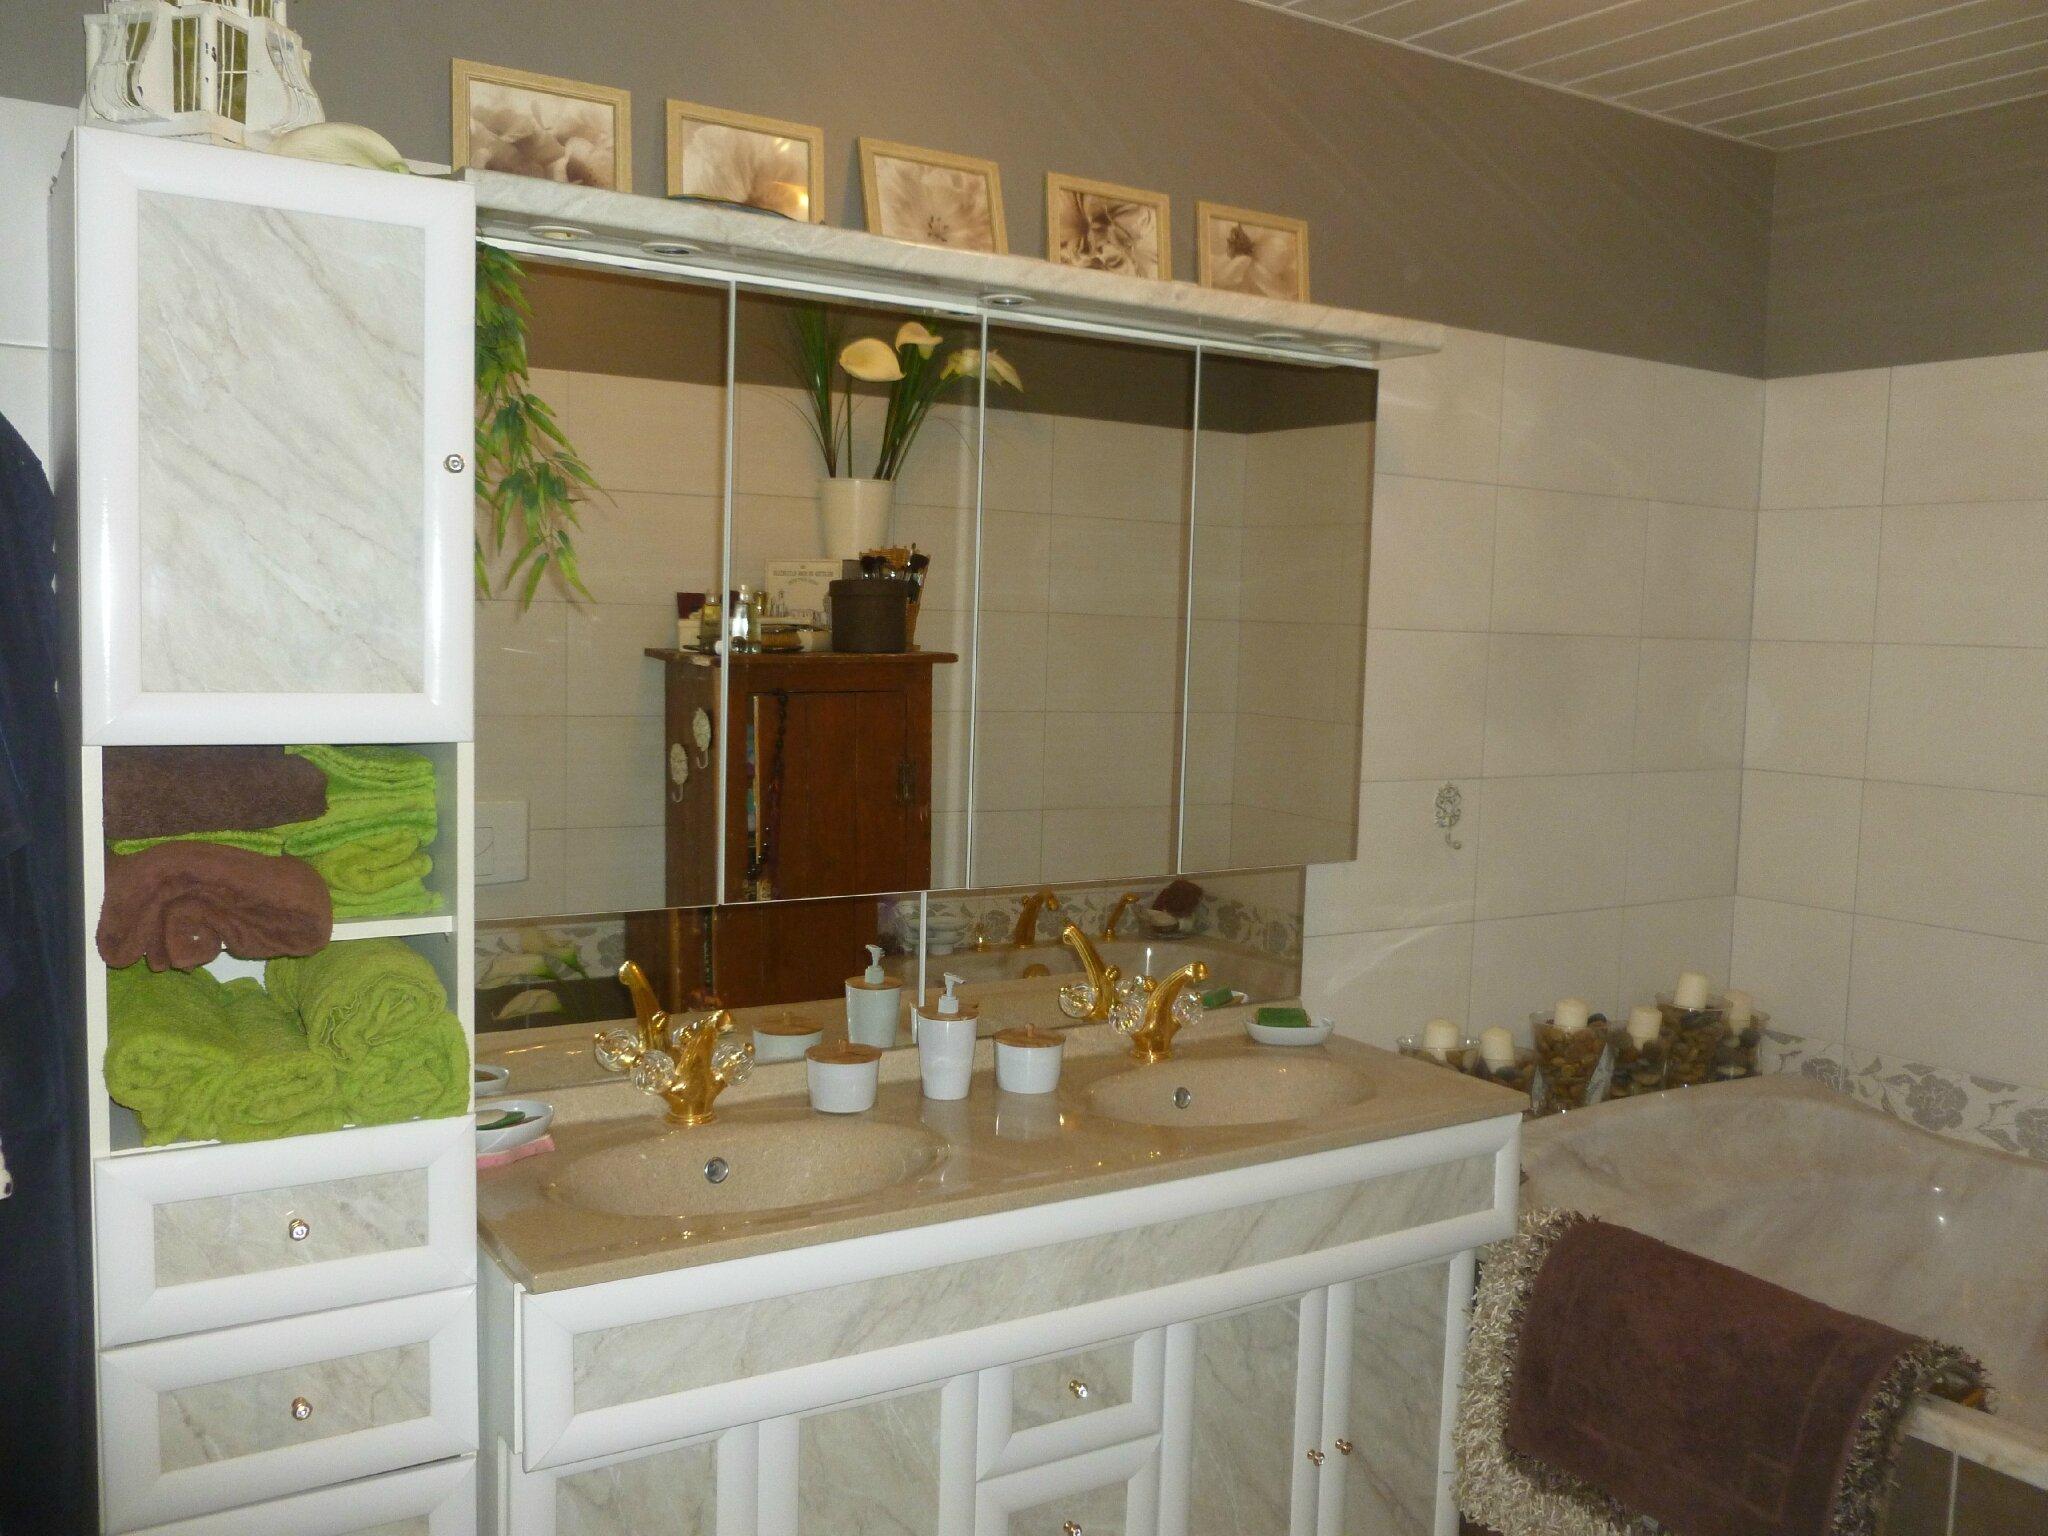 salle de bains rdc jacob delafon baignoire xxl maison livarot